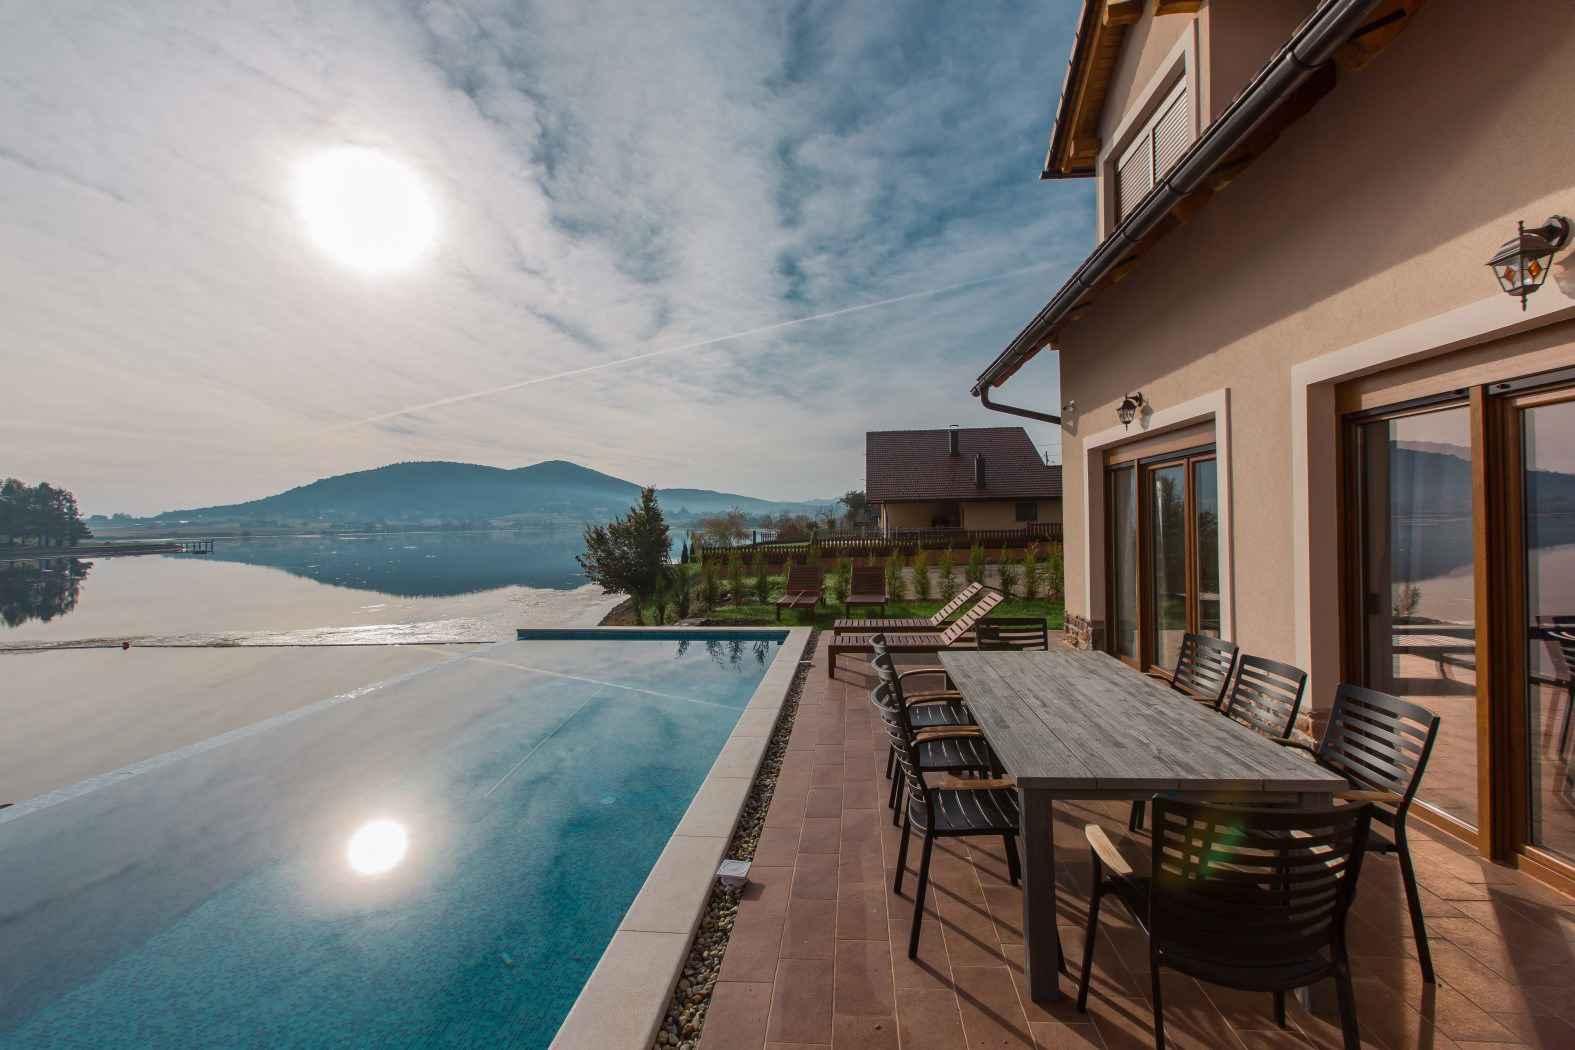 Ferienhaus mit Pool am See gelegen (2047240), Ogulin, , Mittelkroatien, Kroatien, Bild 8